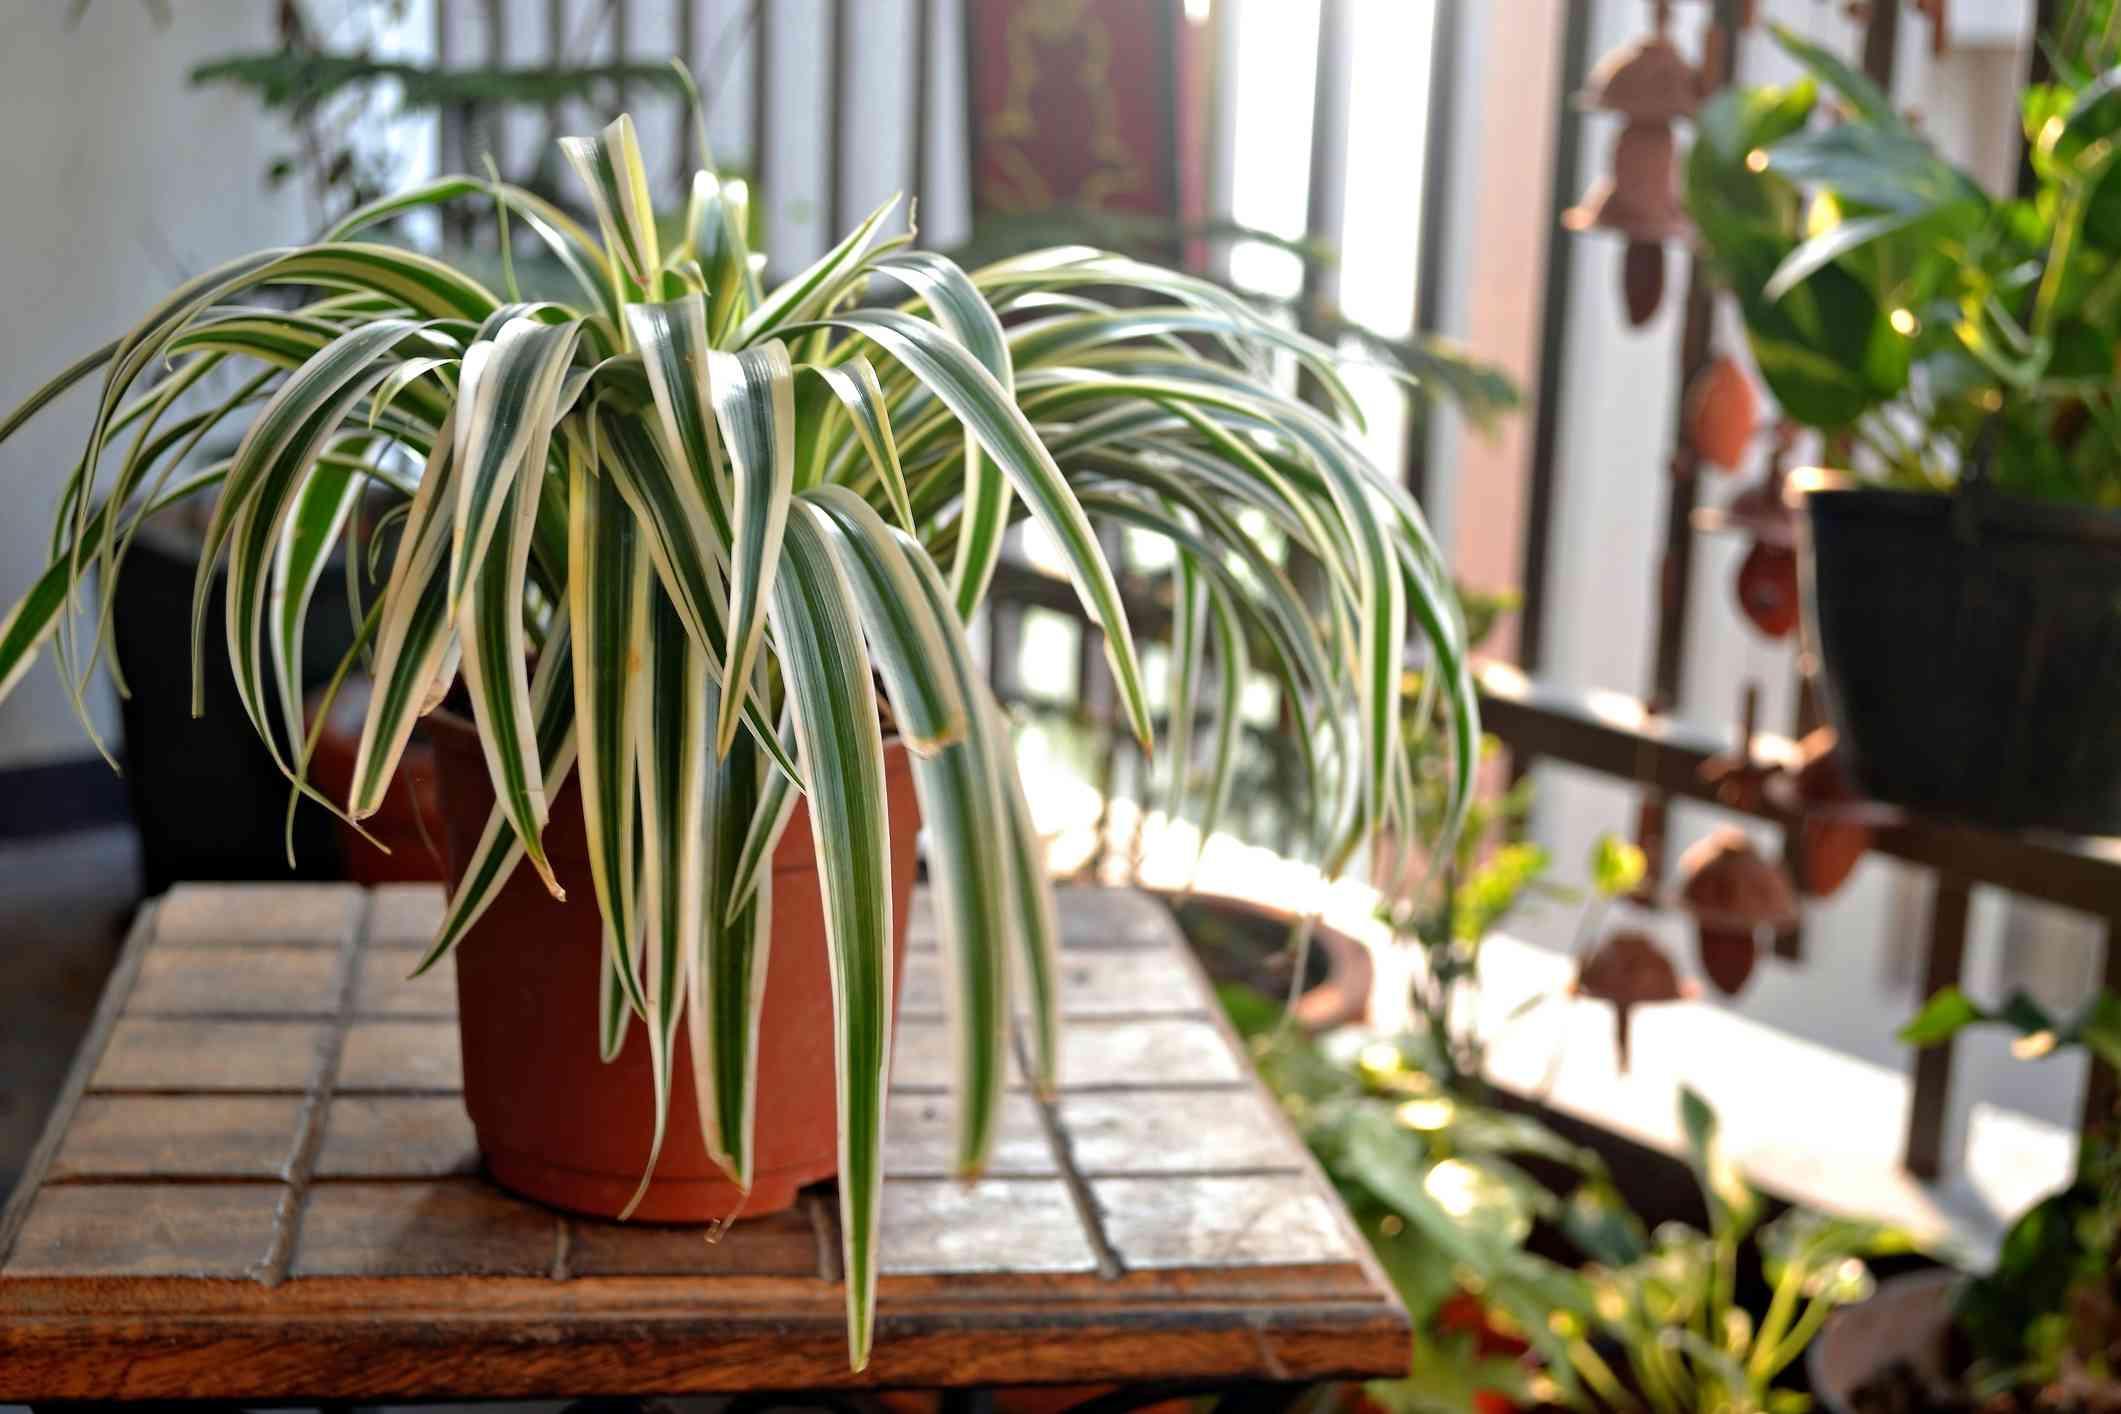 Chlorophytum comosum, ribbon plant, in a pot